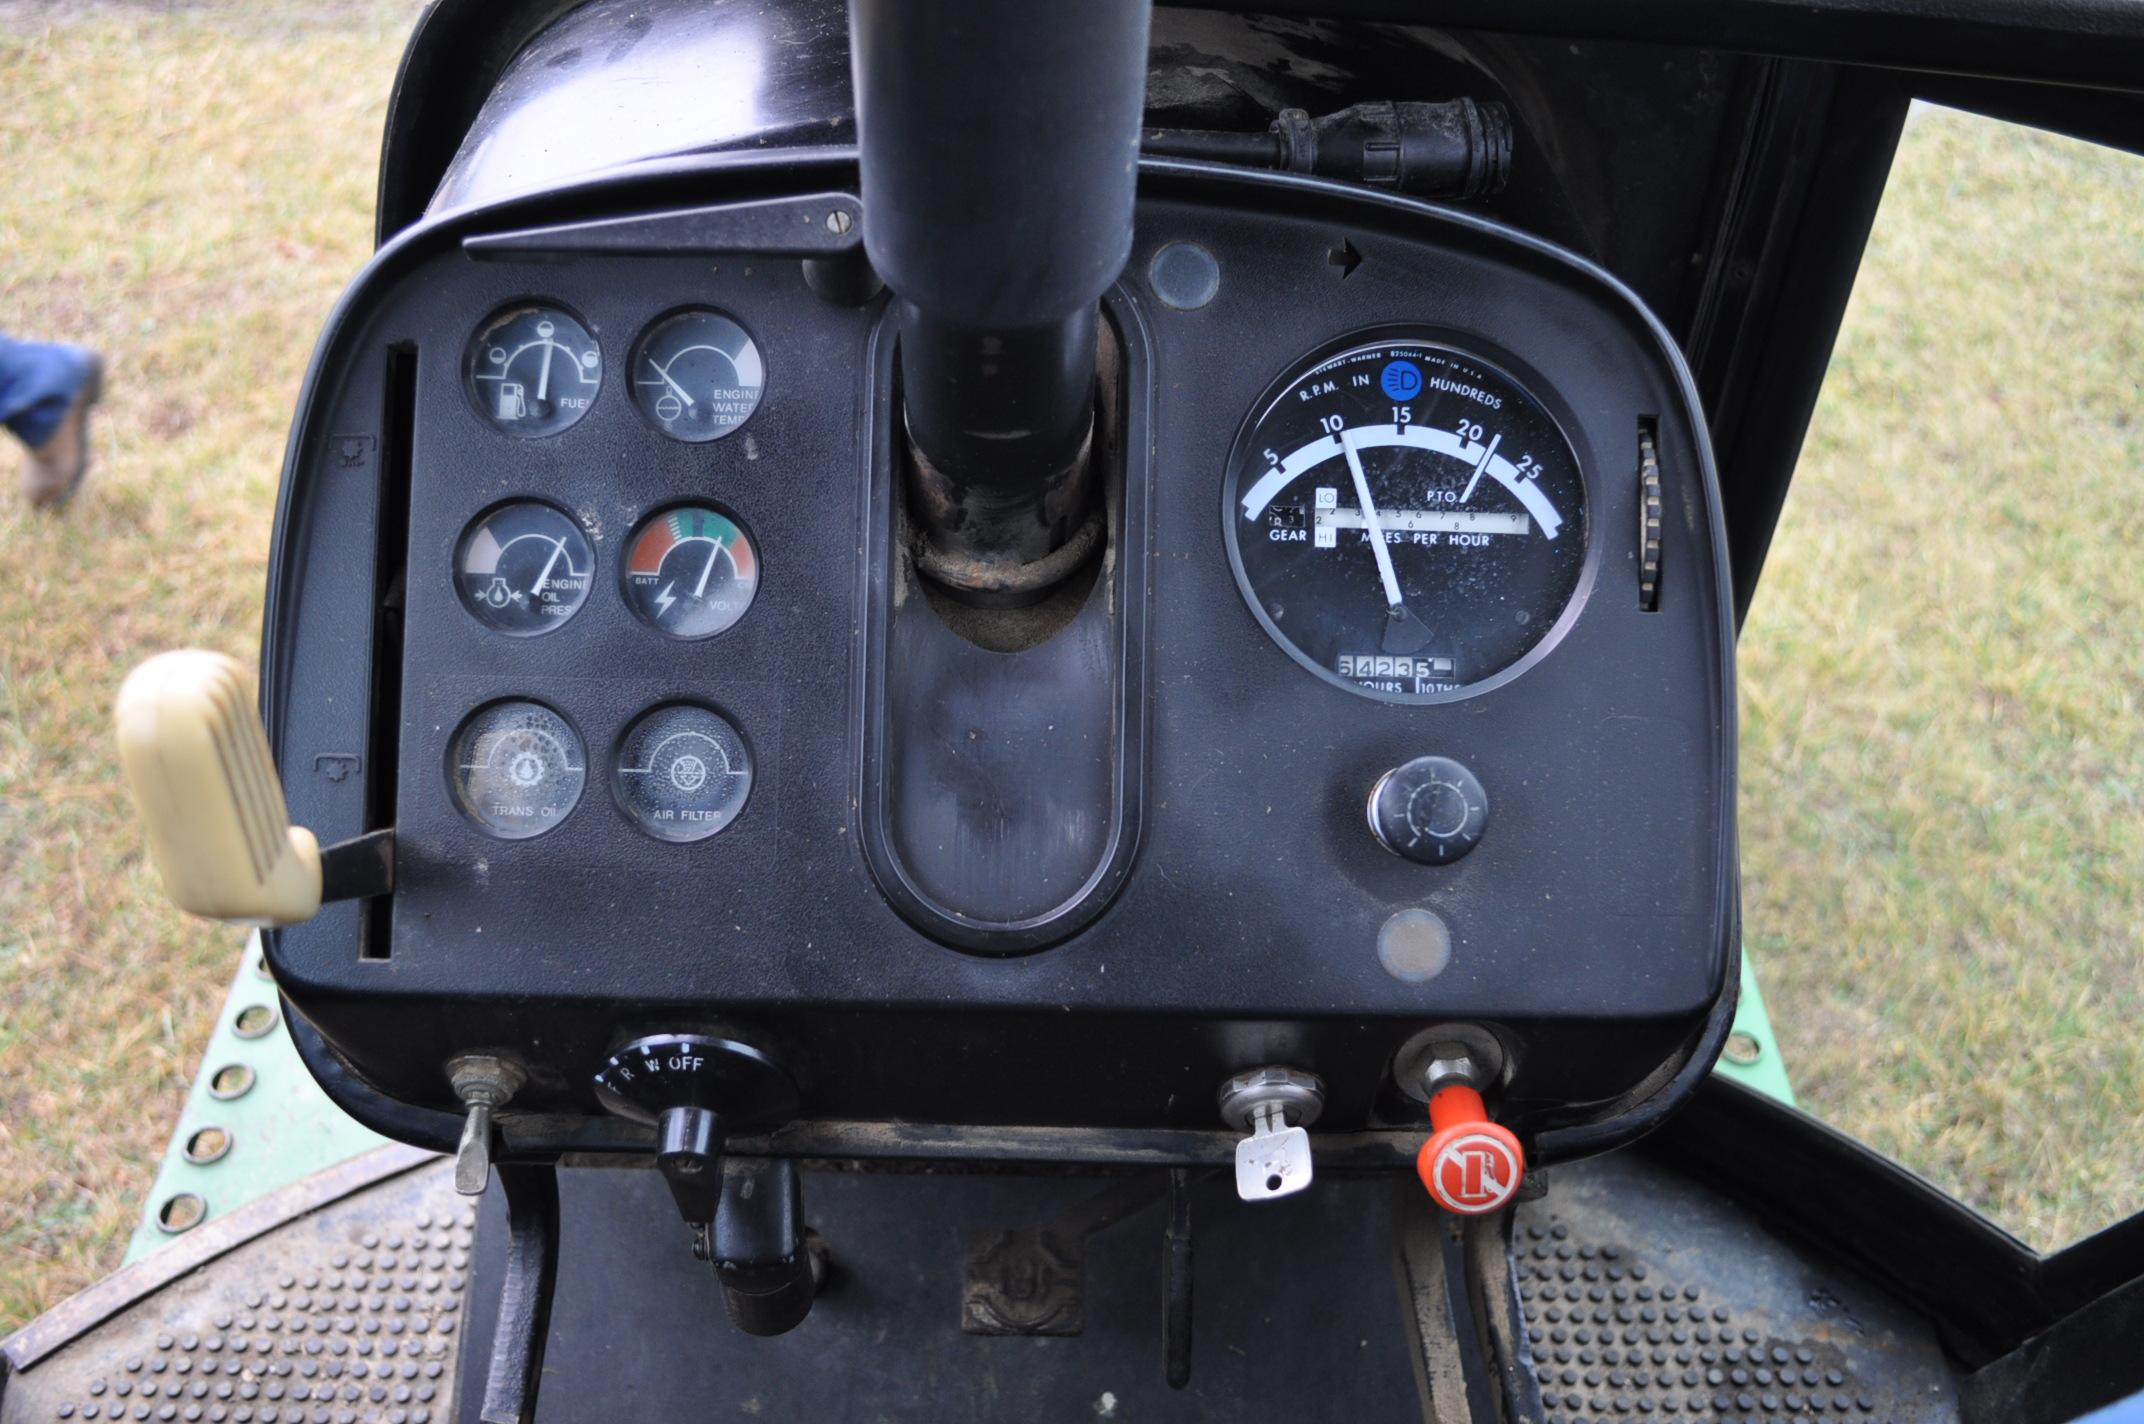 John Deere 4430 tractor, diesel, 18.4-34 hub duals, 10.00-16 front, CHA, Quad range, 2 hyd - Image 18 of 20